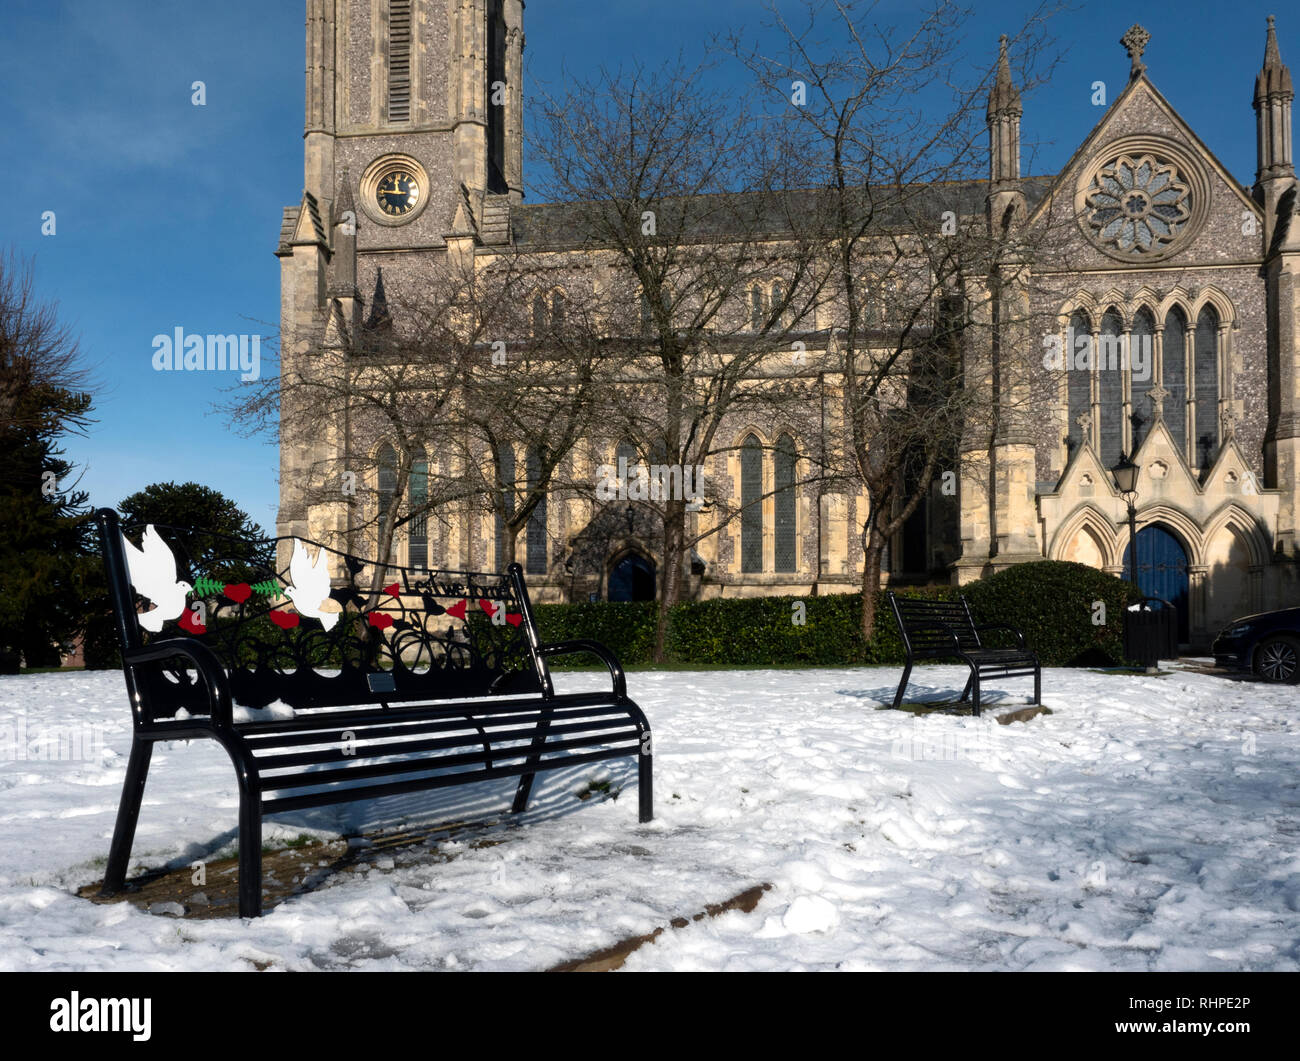 St Mary's Church, Andover, Hampshire, England, United Kingdom - Stock Image